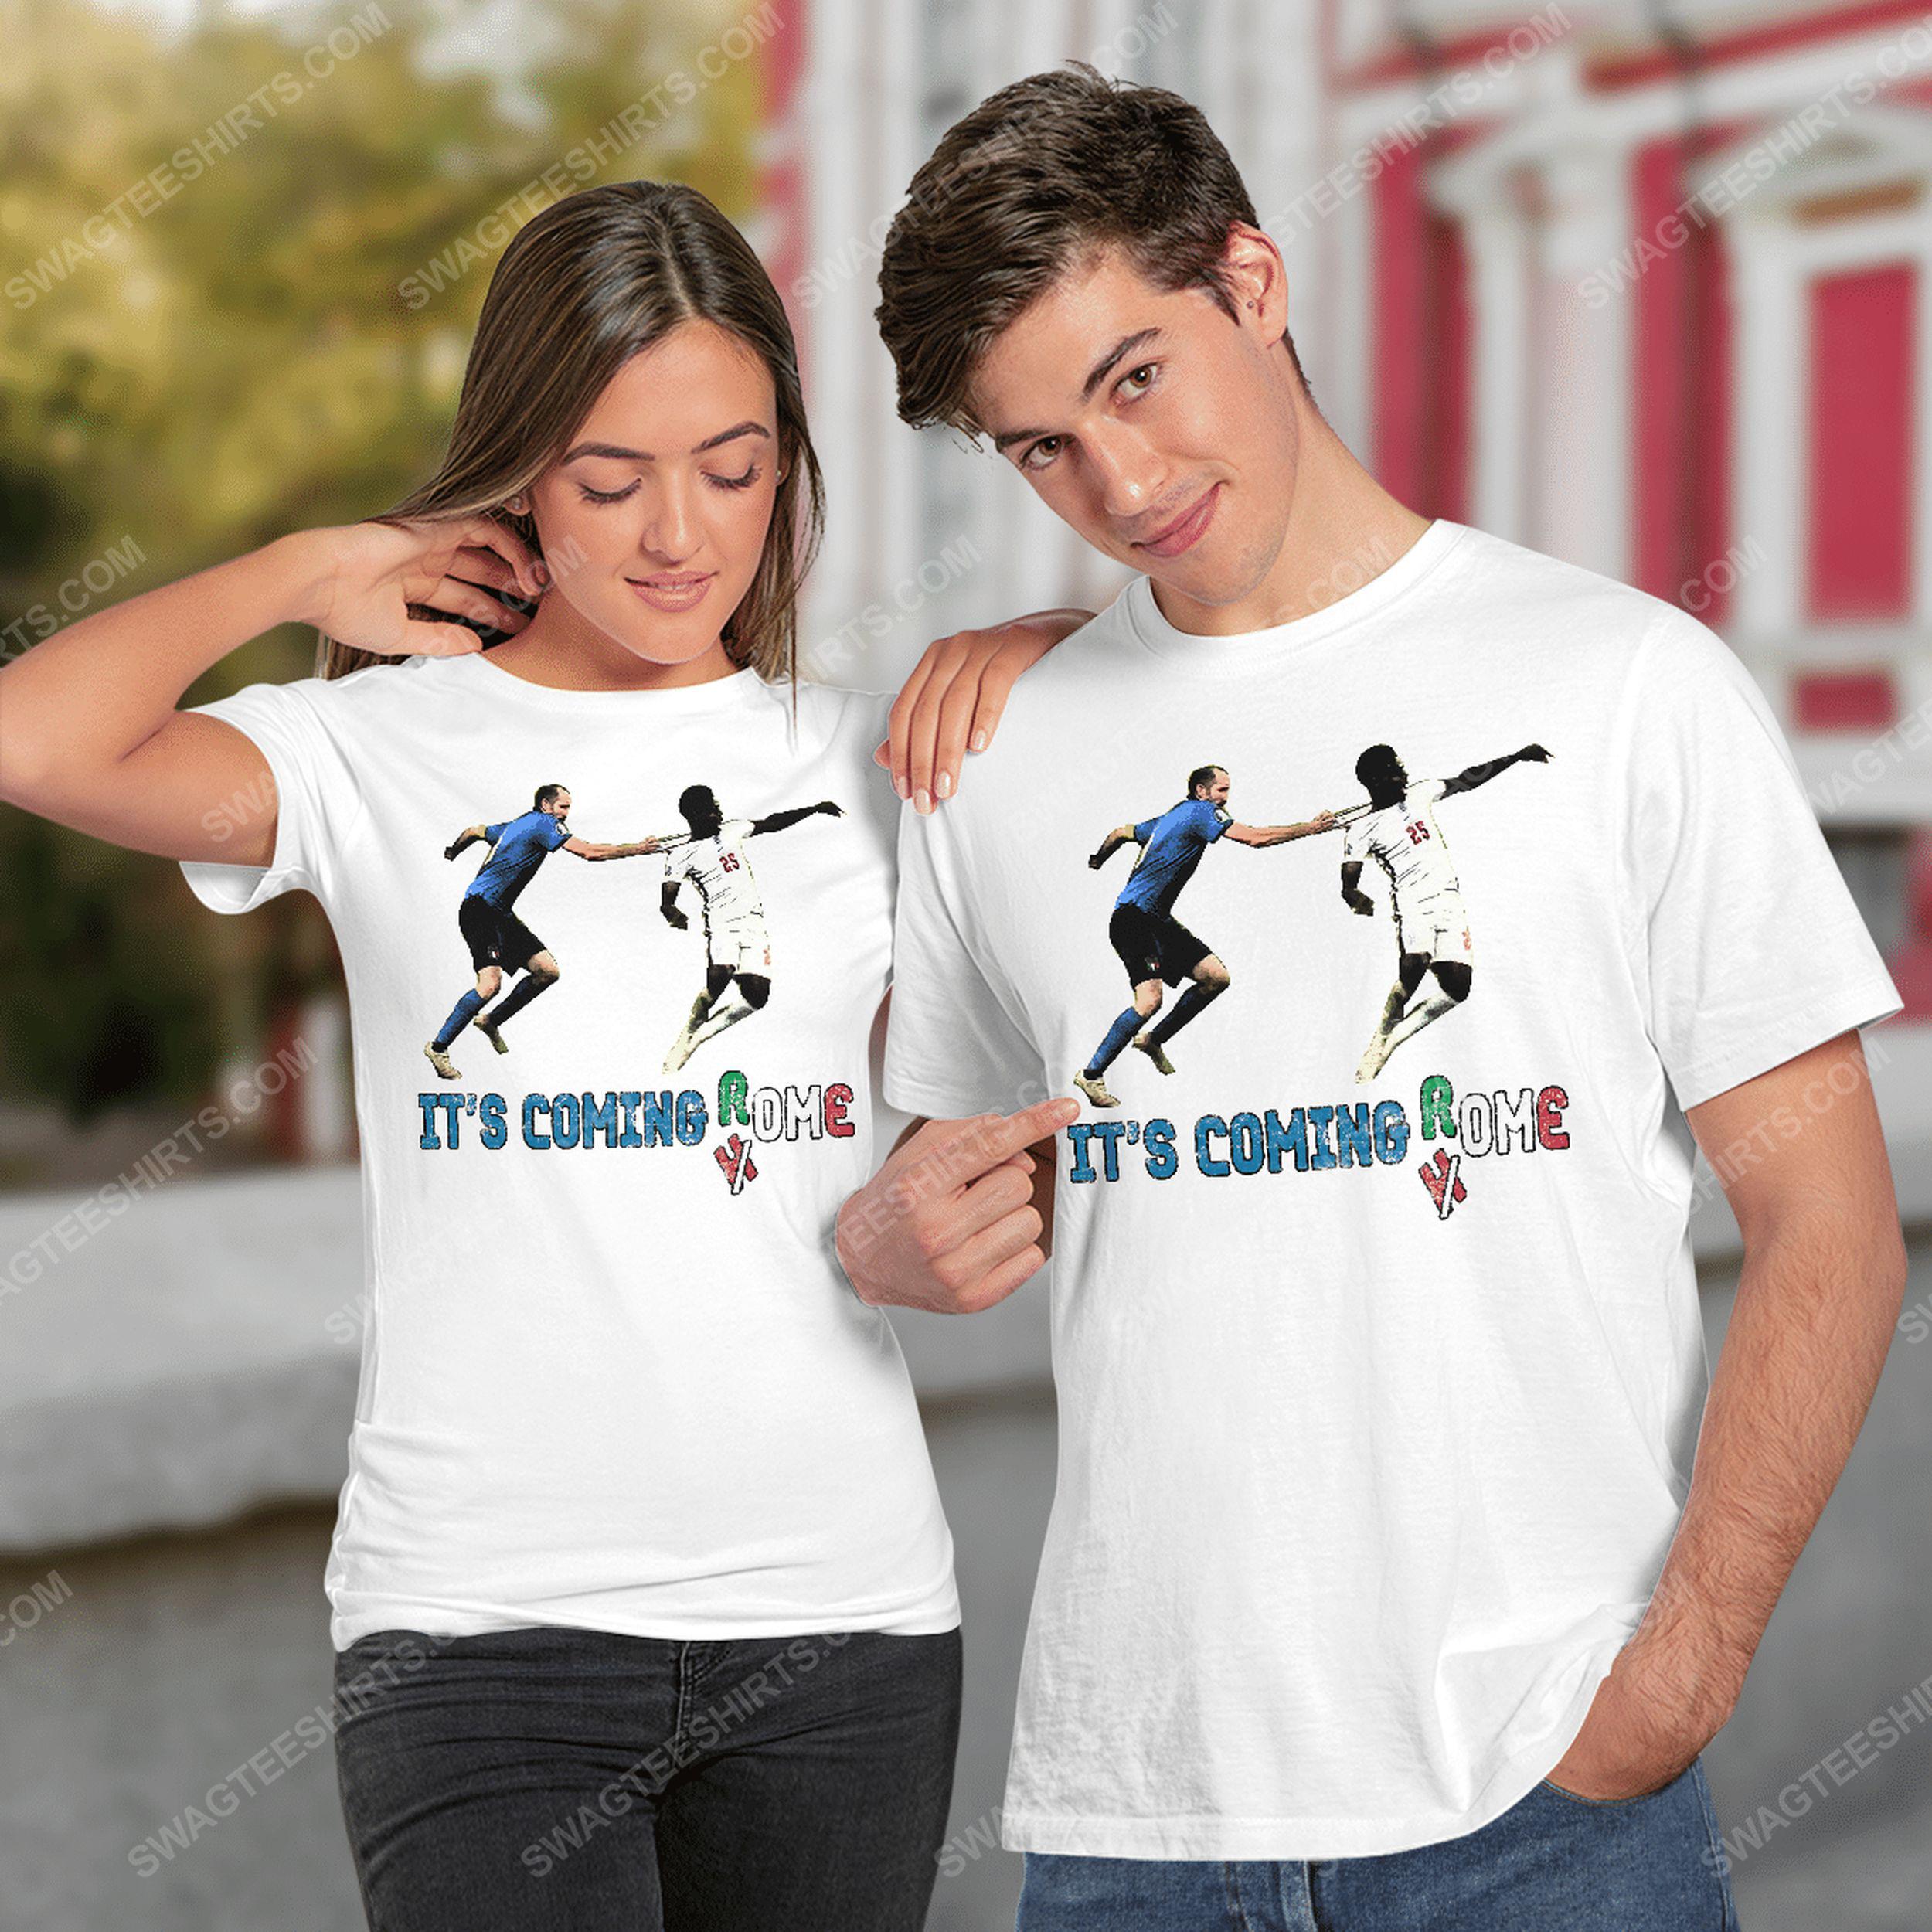 It's coming rome italy celebrate winning euro tshirt(1)